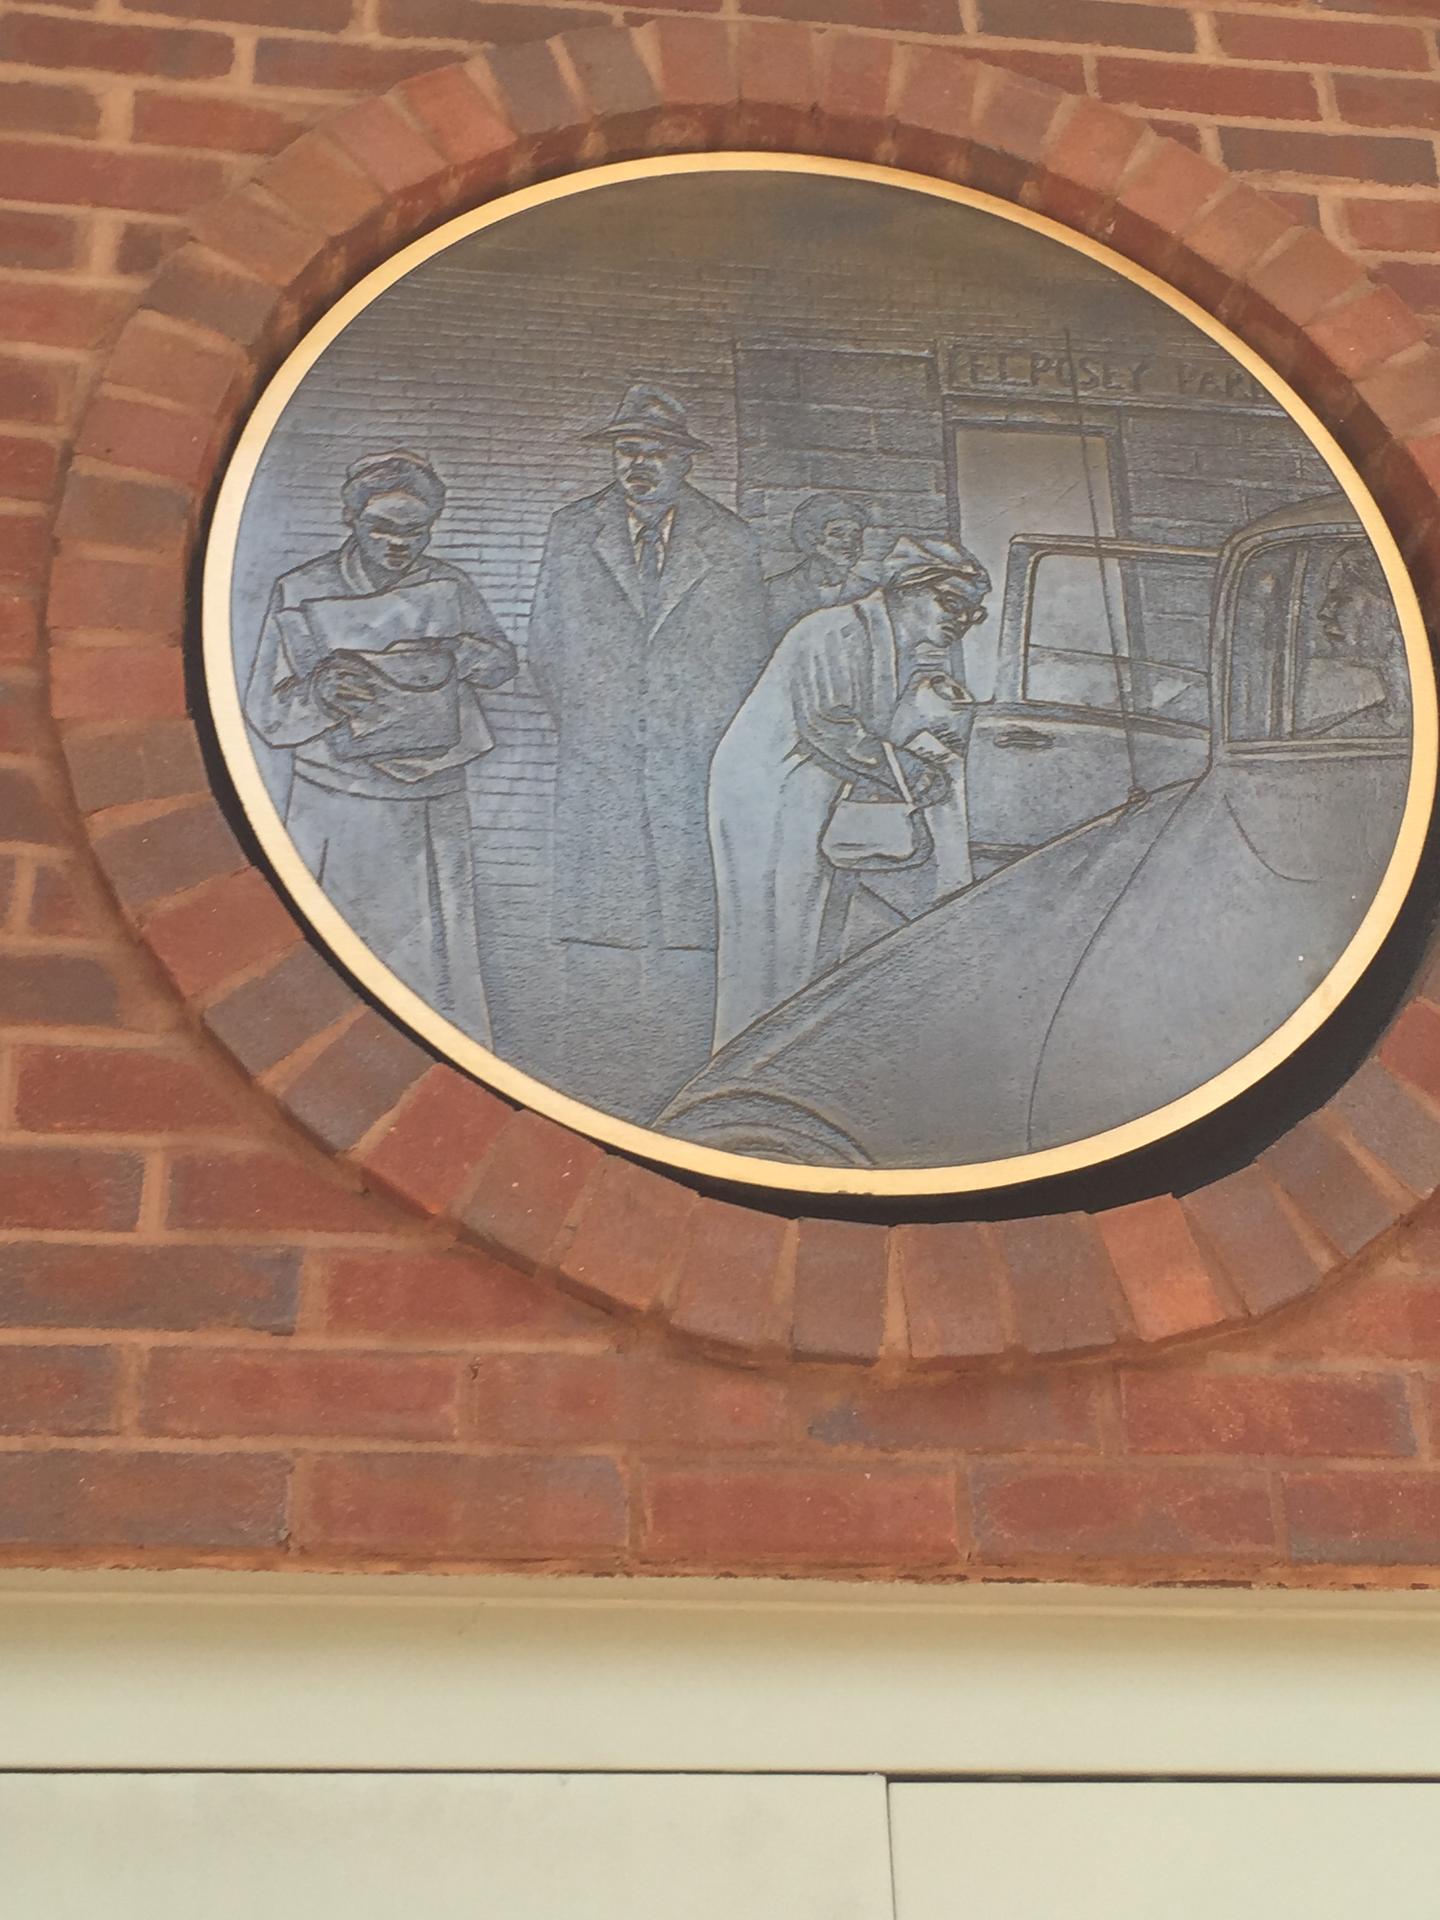 Rosa Parks Murals